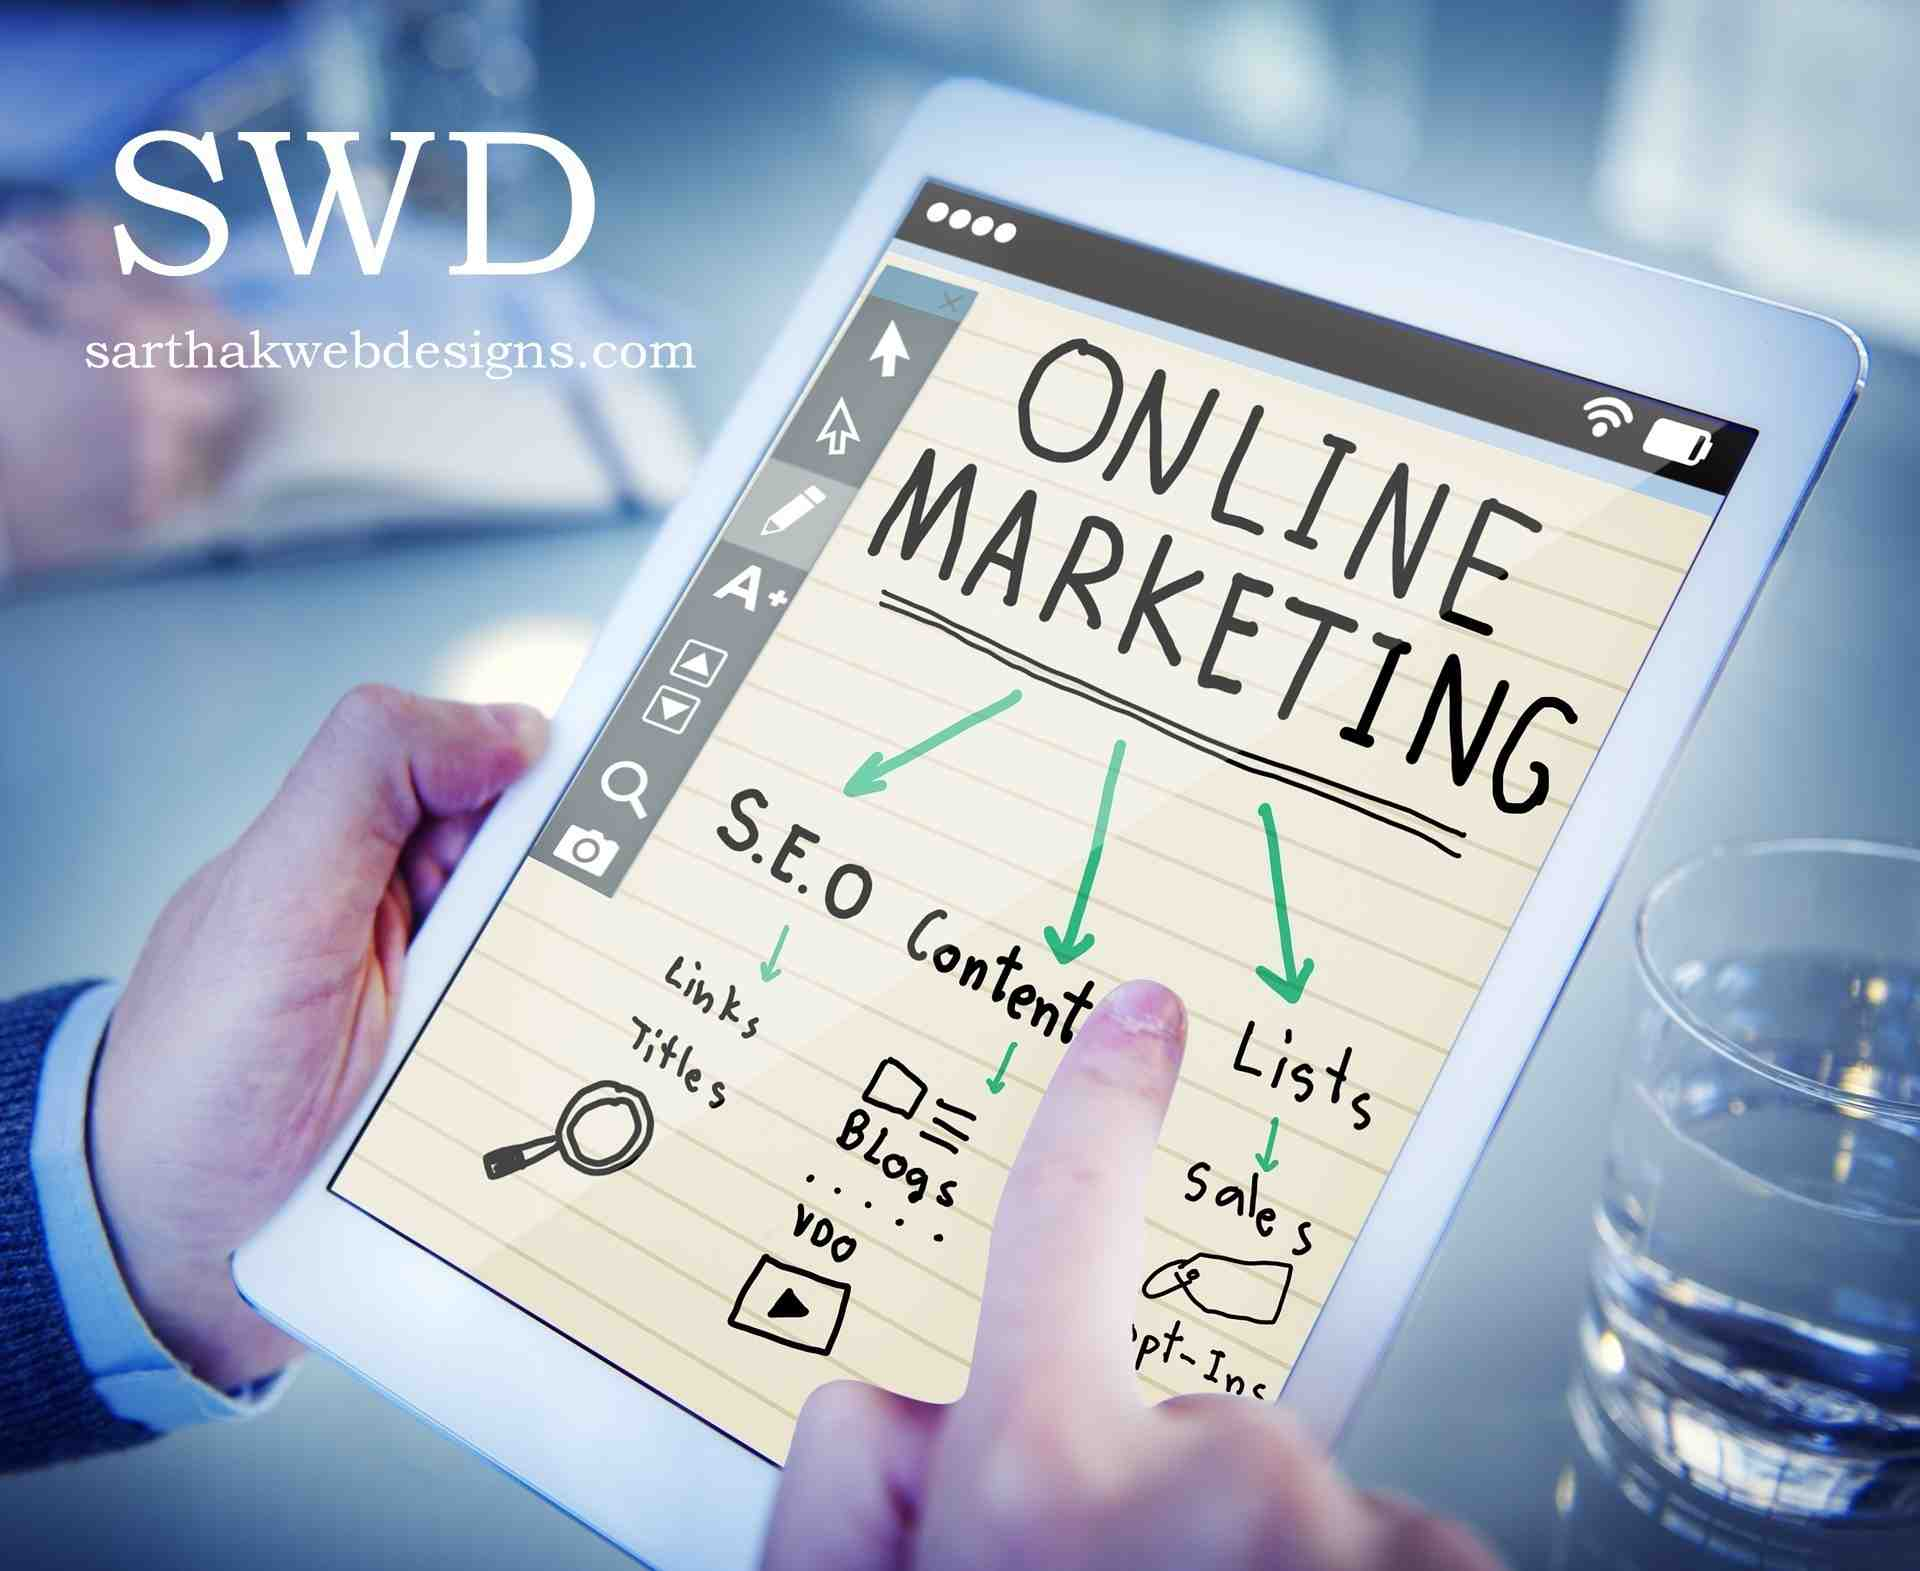 online-marketing-swd-image2017.jpg